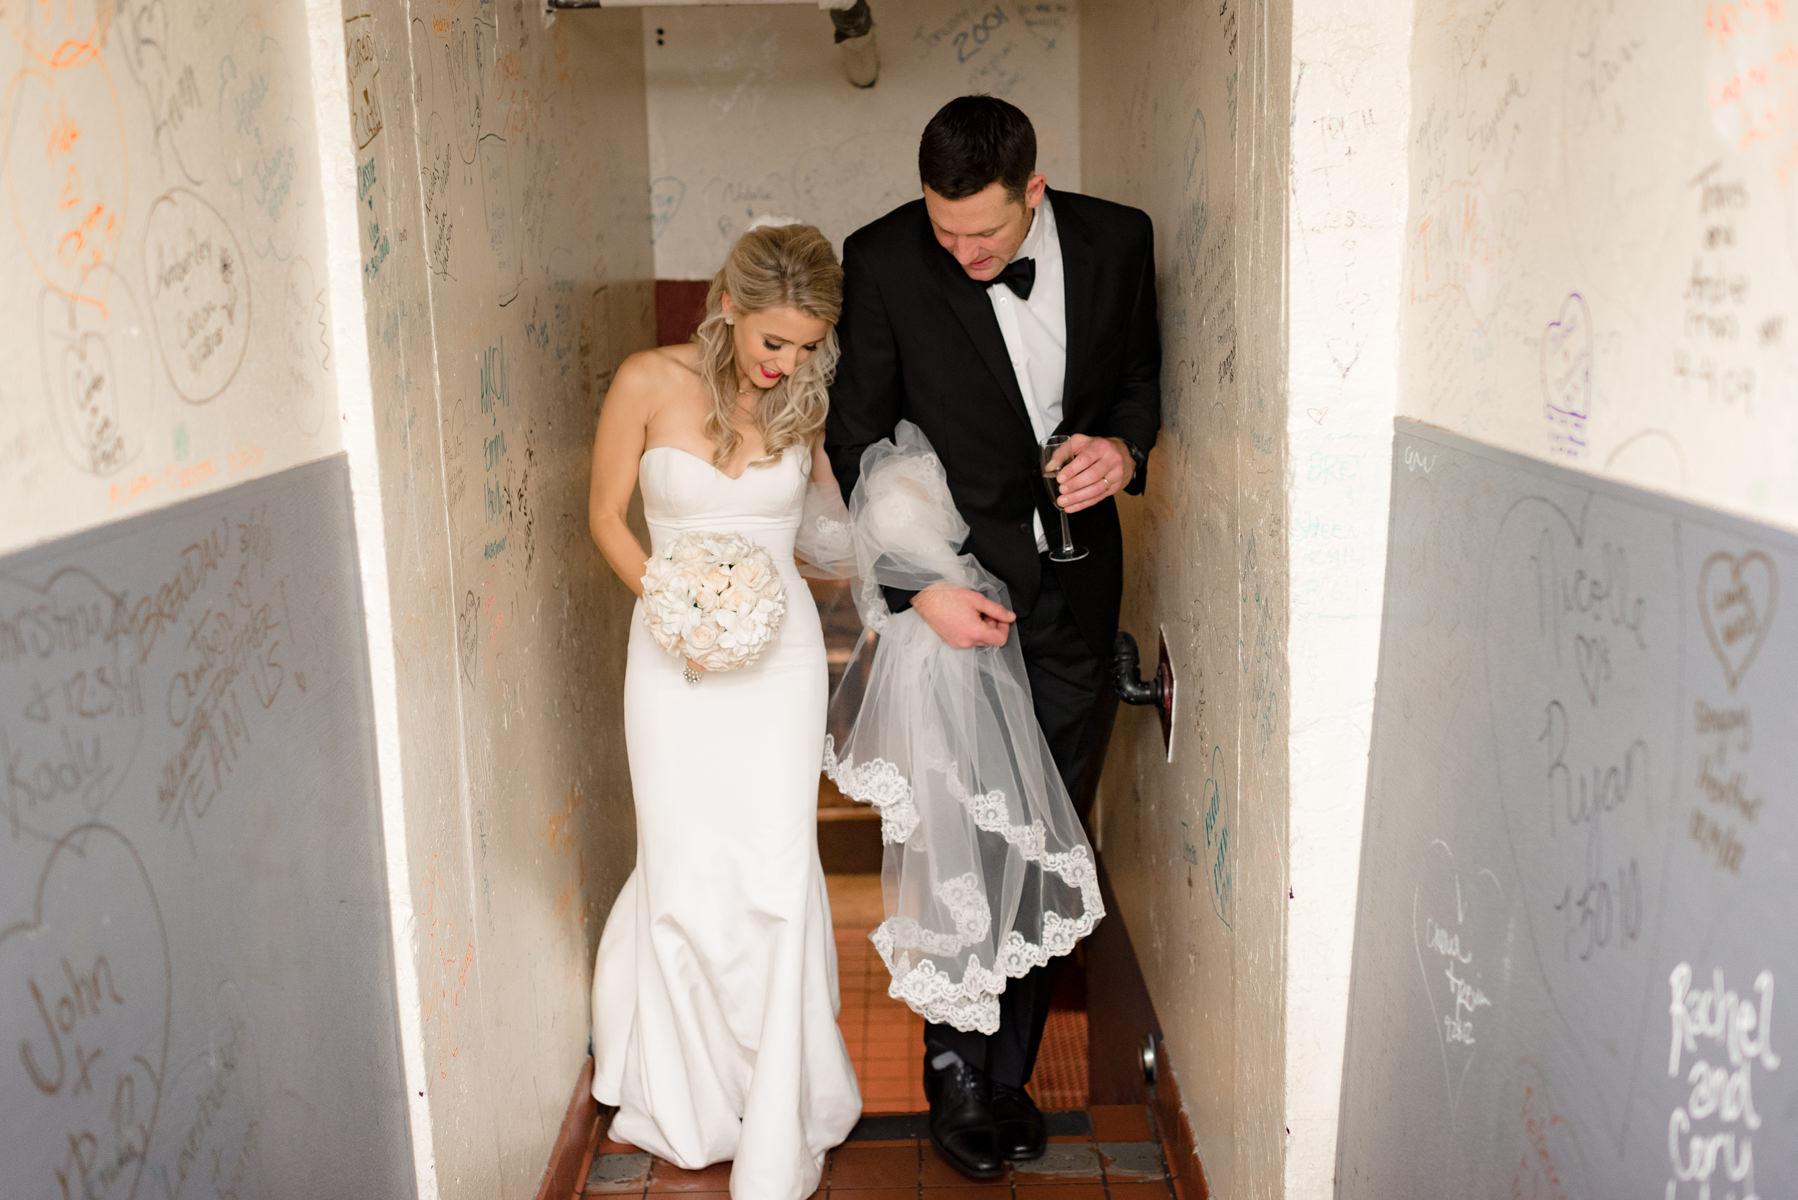 Andrew Tat - Documentary Wedding Photography - Lake Union Cafe - Seattle, Washington -Rachel and Ryan - 21.jpg